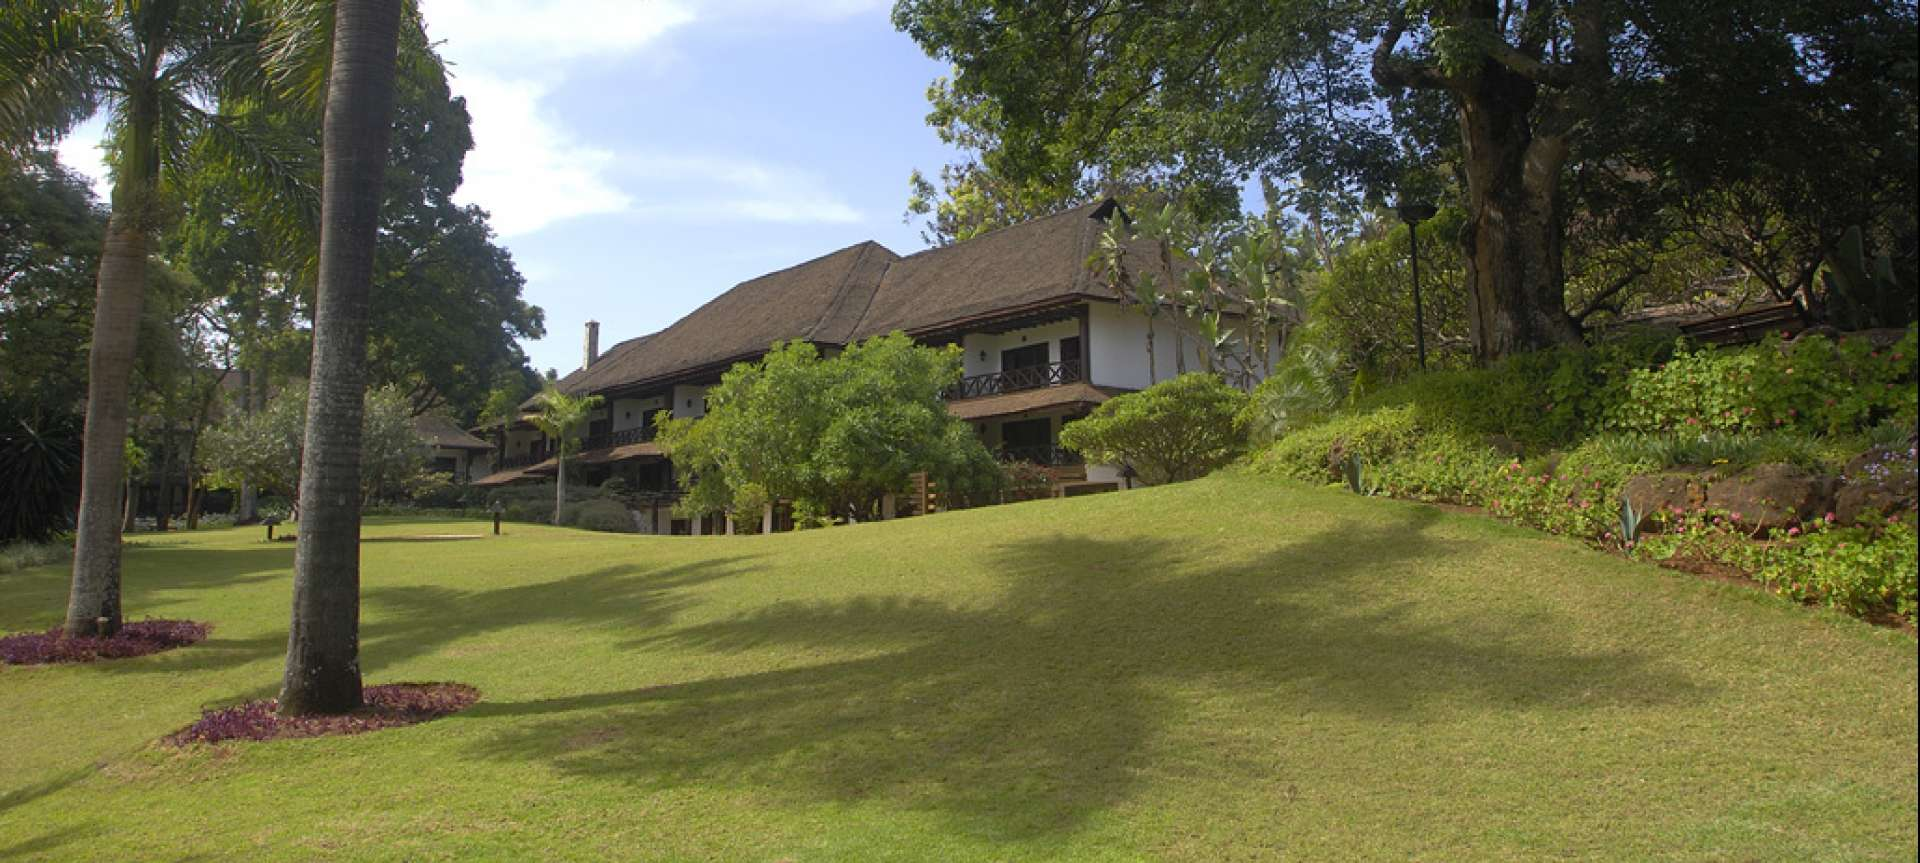 Safari Park Hotel And Casino Discover Africa Safaris